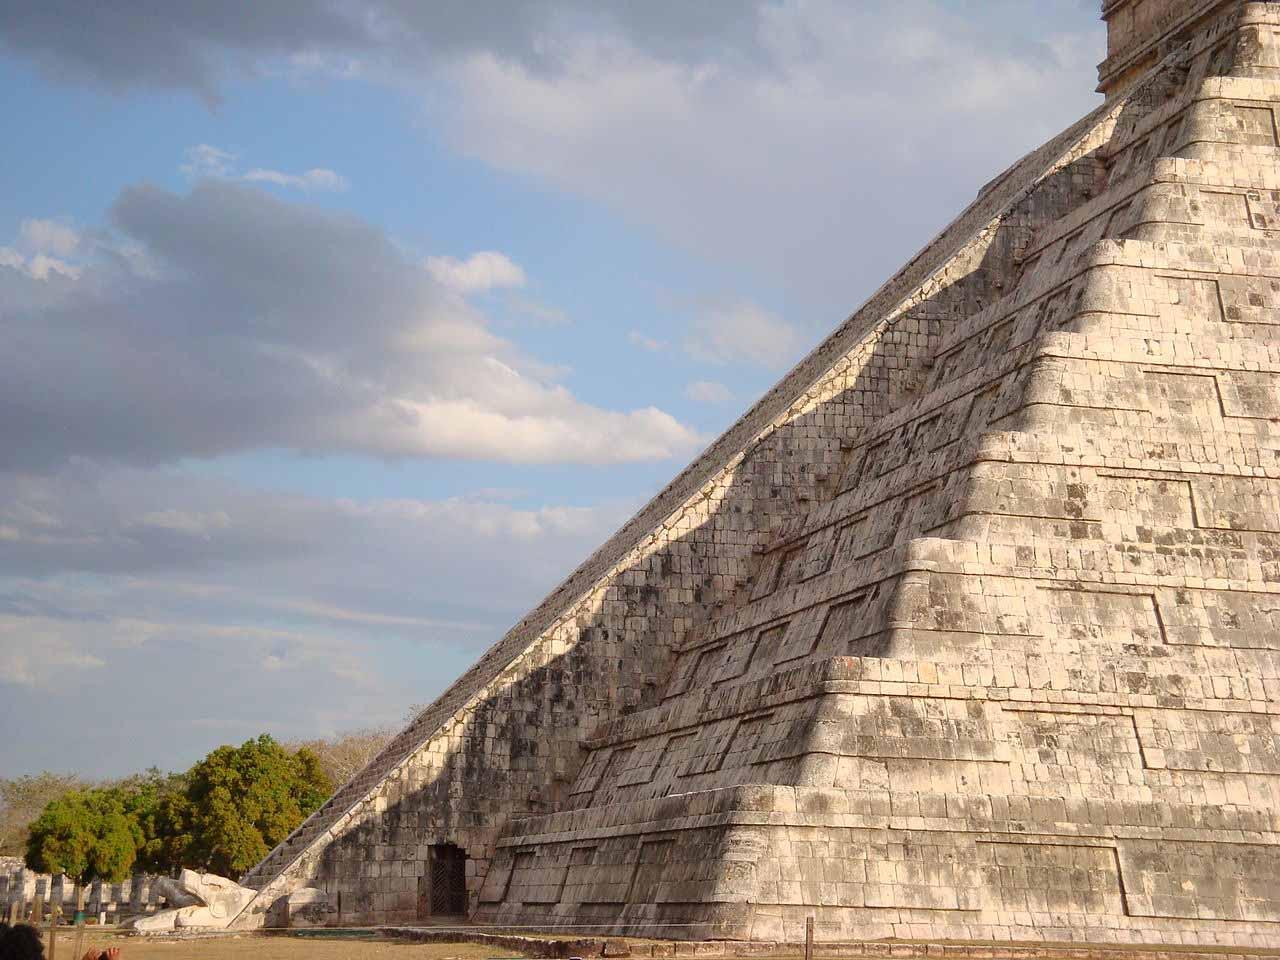 Kukulkan, varianta mayașă a zeului aztec Quetzalcoatl